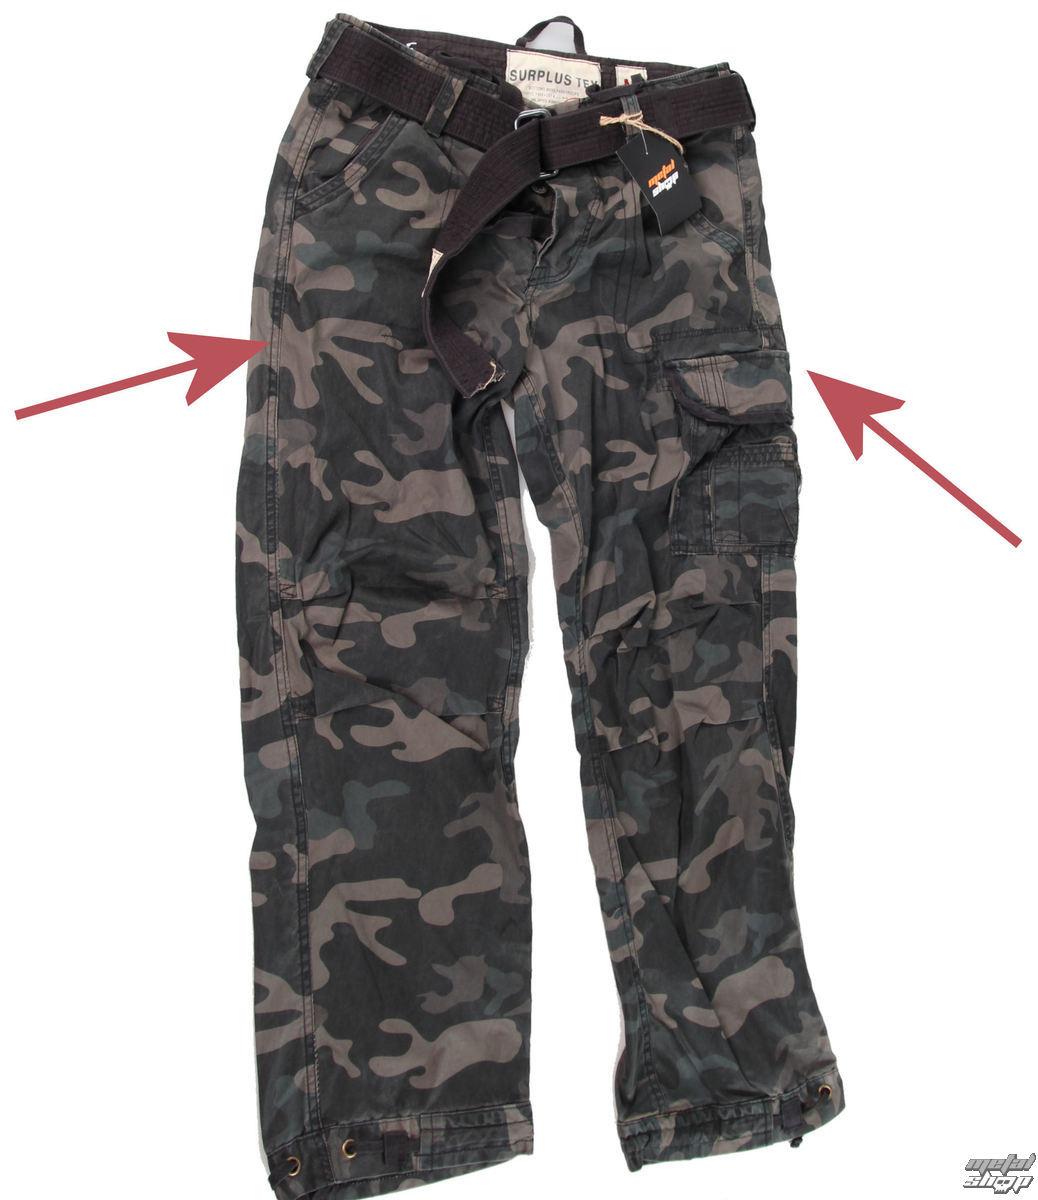 kalhoty pánské SURPLUS - Premium Vintage - Black Camo - POŠKOZENÉ - N158